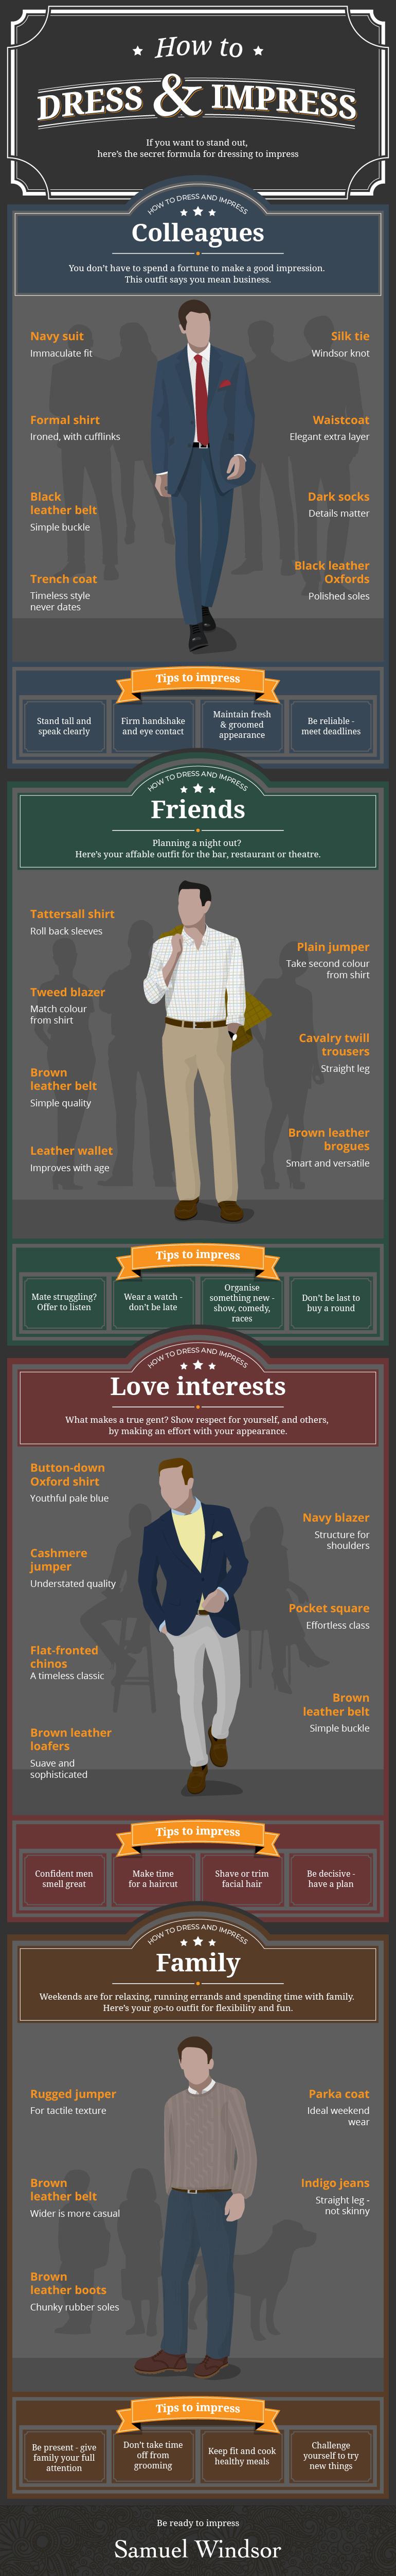 How To Dress and Impress #infographic #Men Fashion #Fashion #Dress #Impress